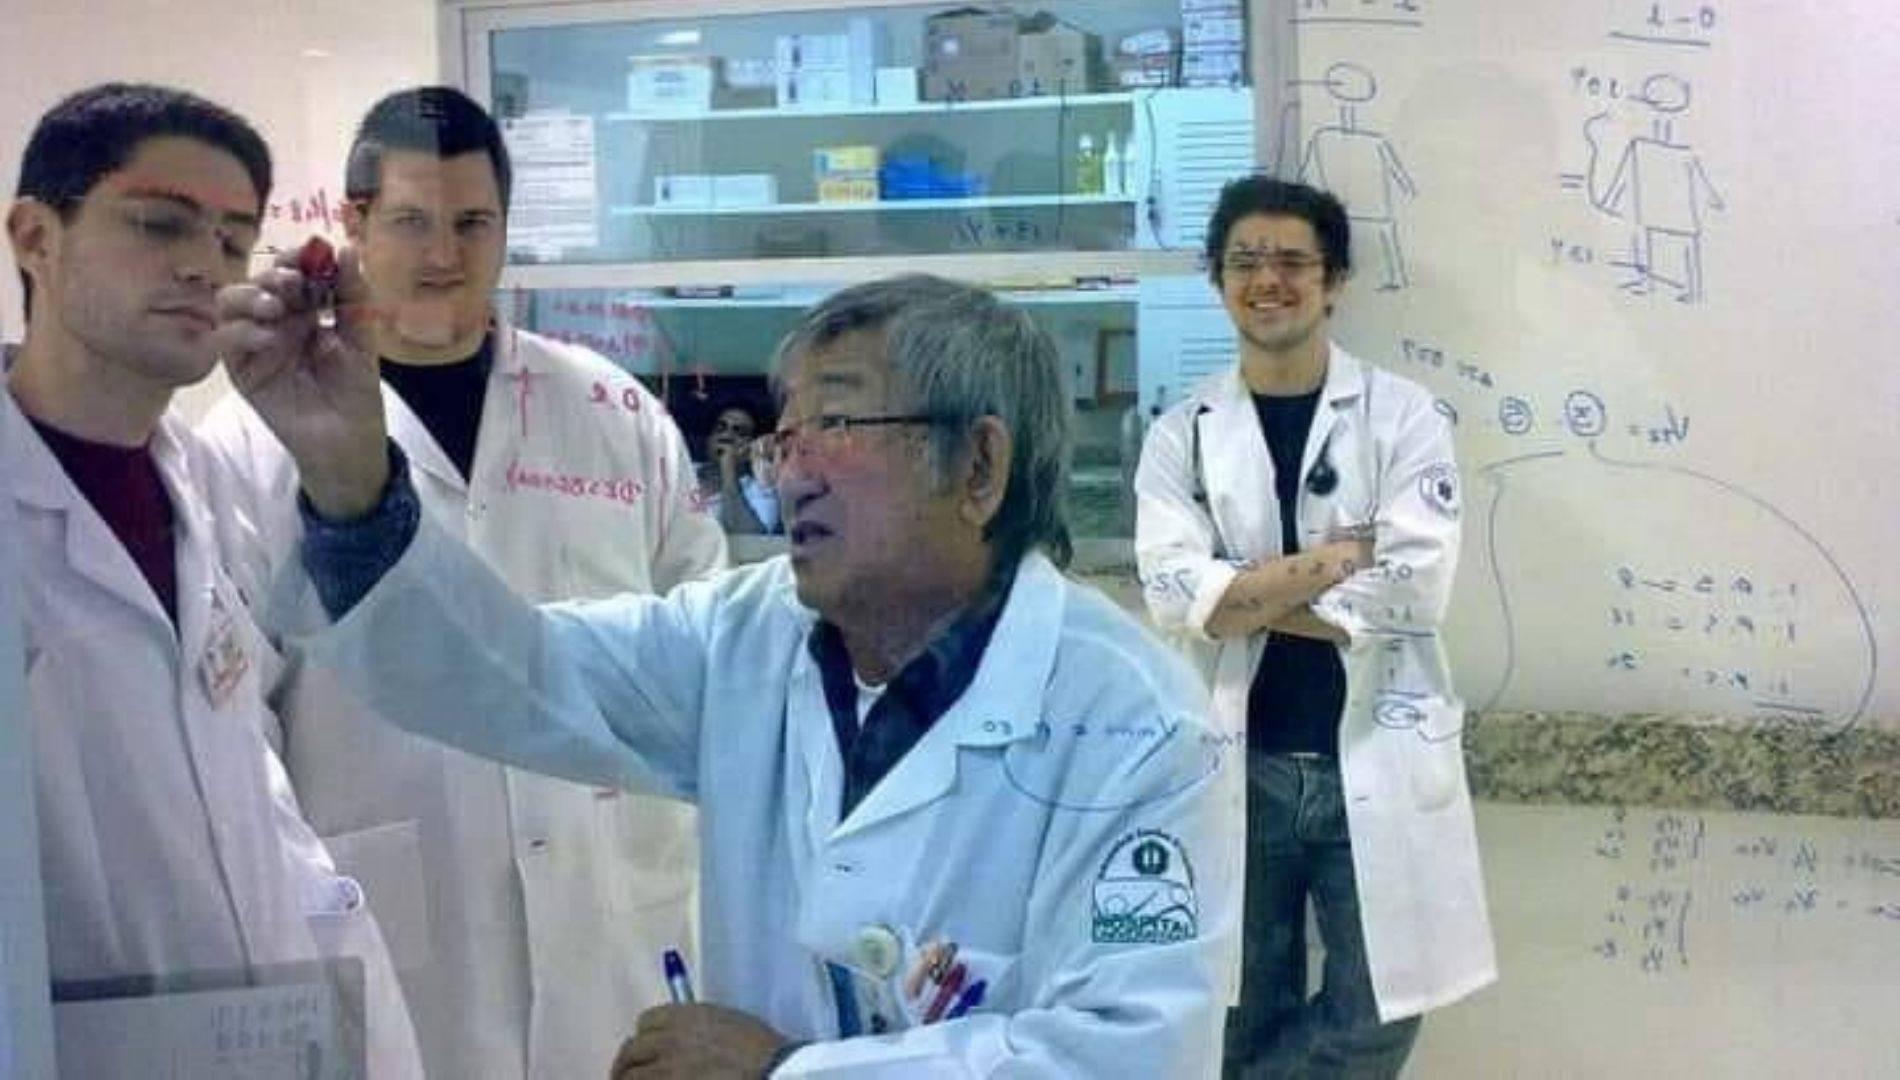 Dr. Miguelito durante aula na UEL.